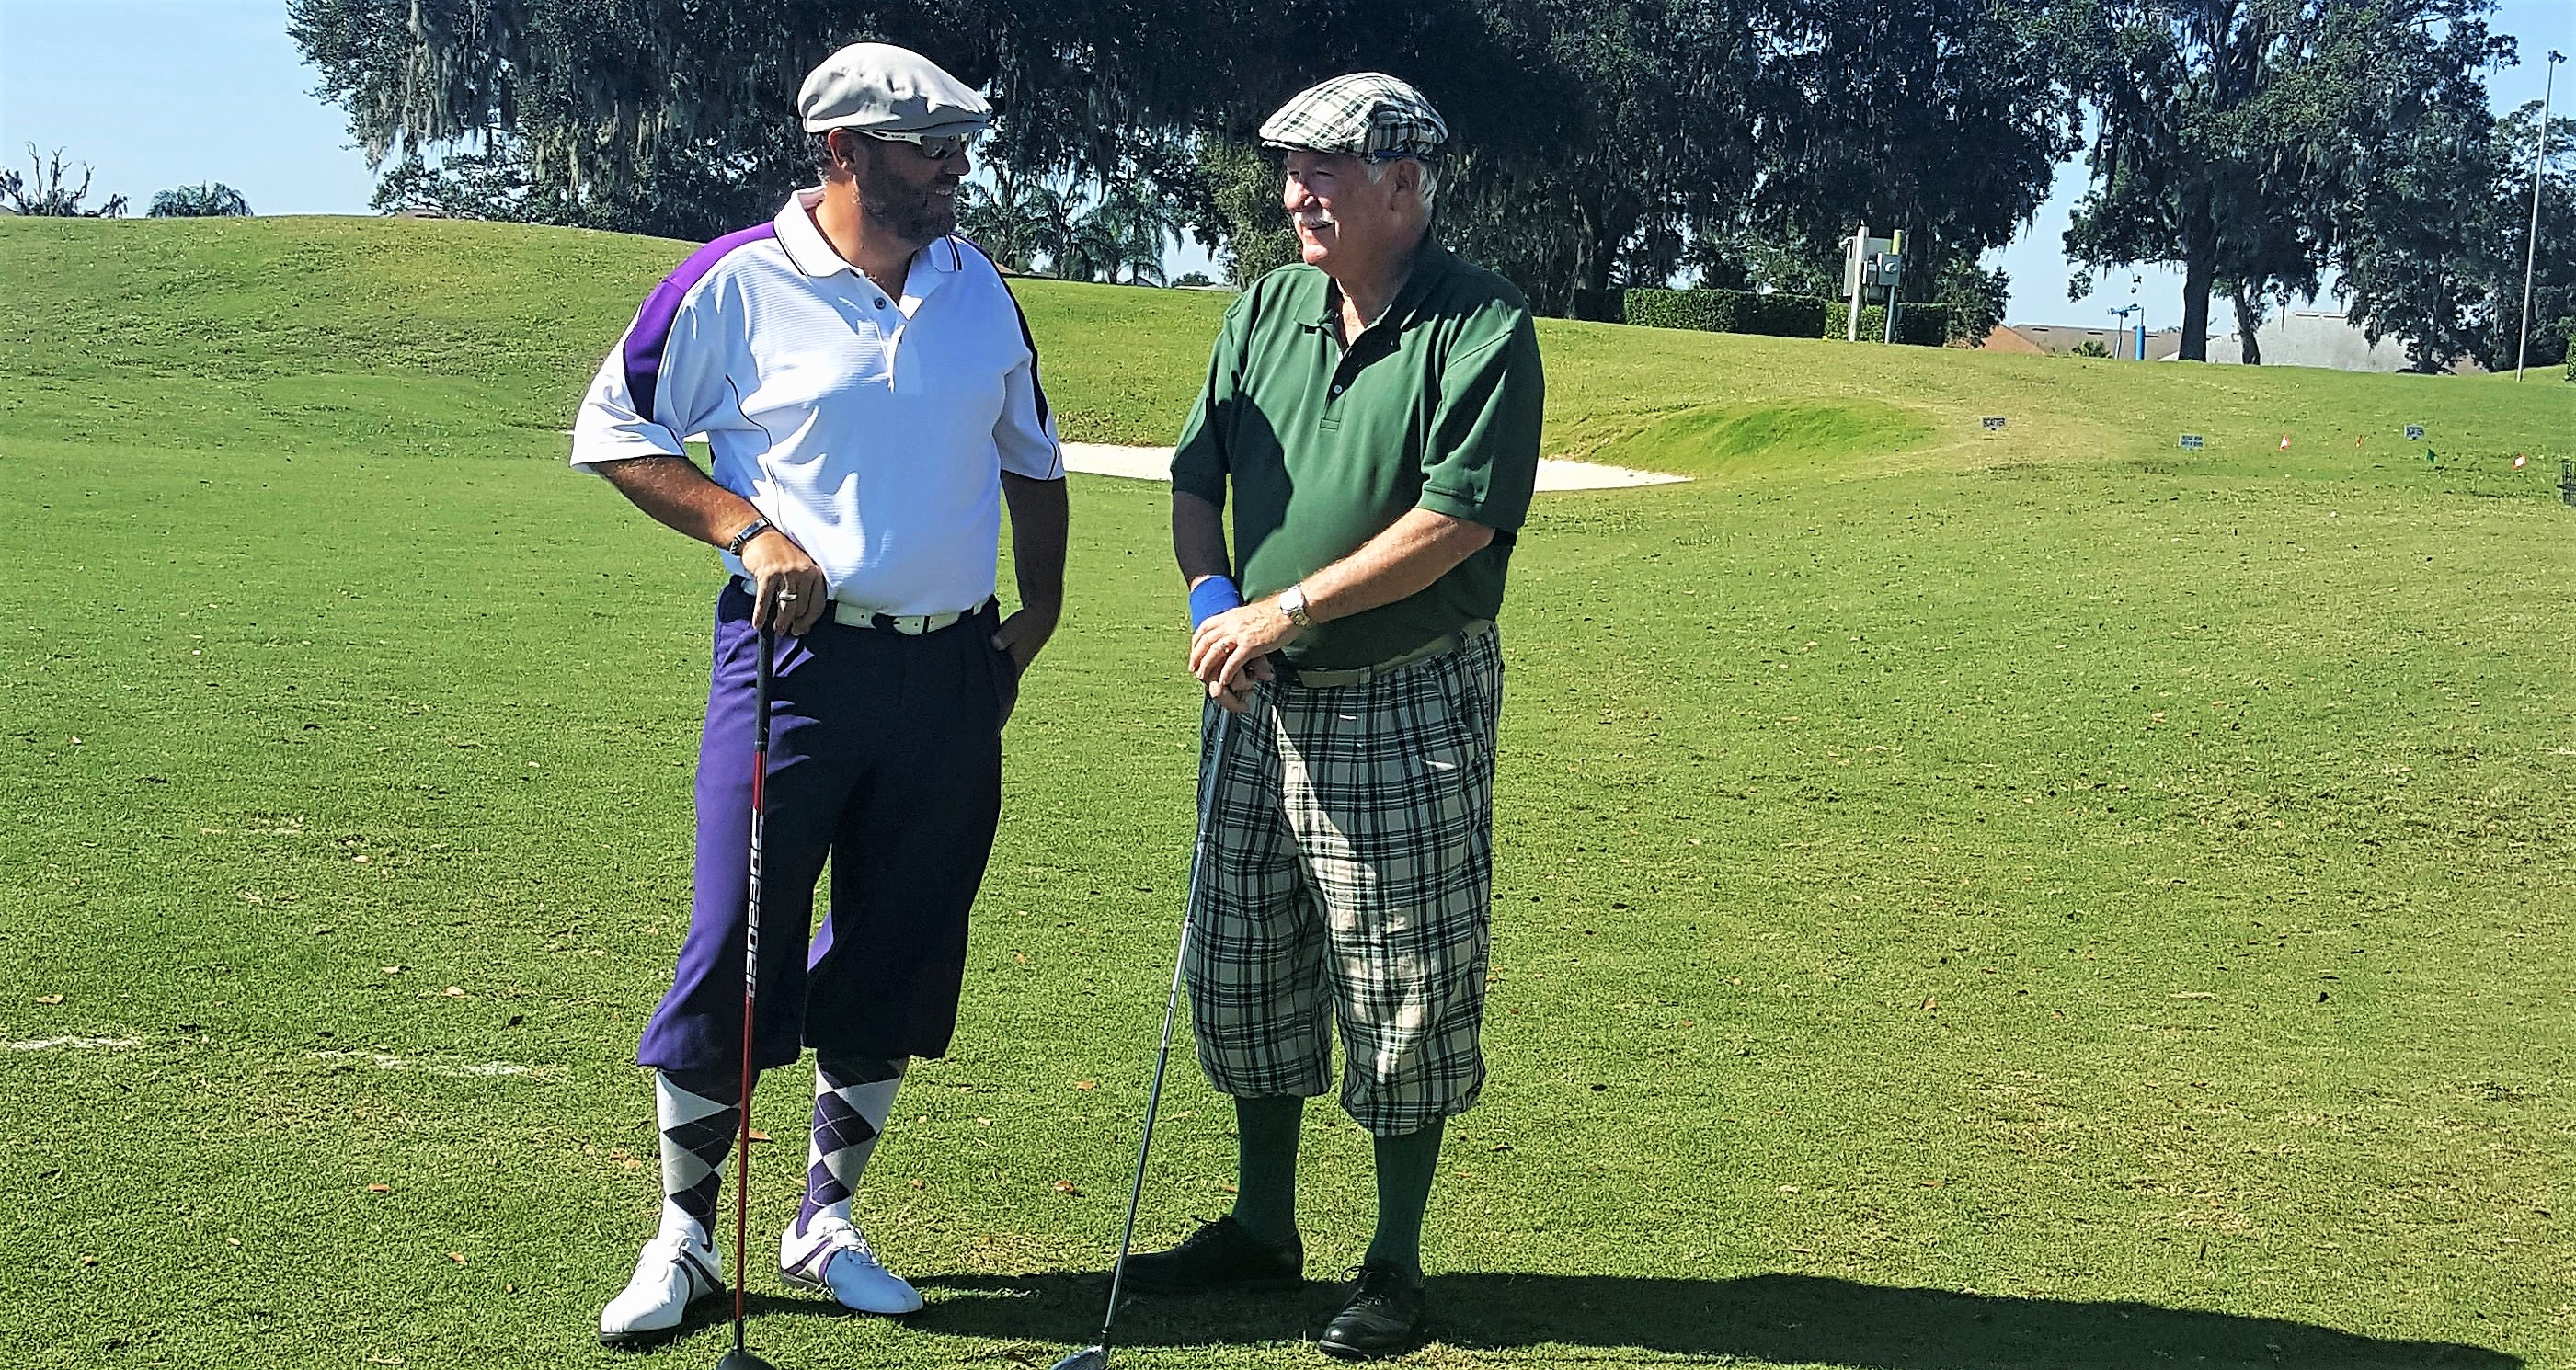 GolfKnickers.com Revive Kickers